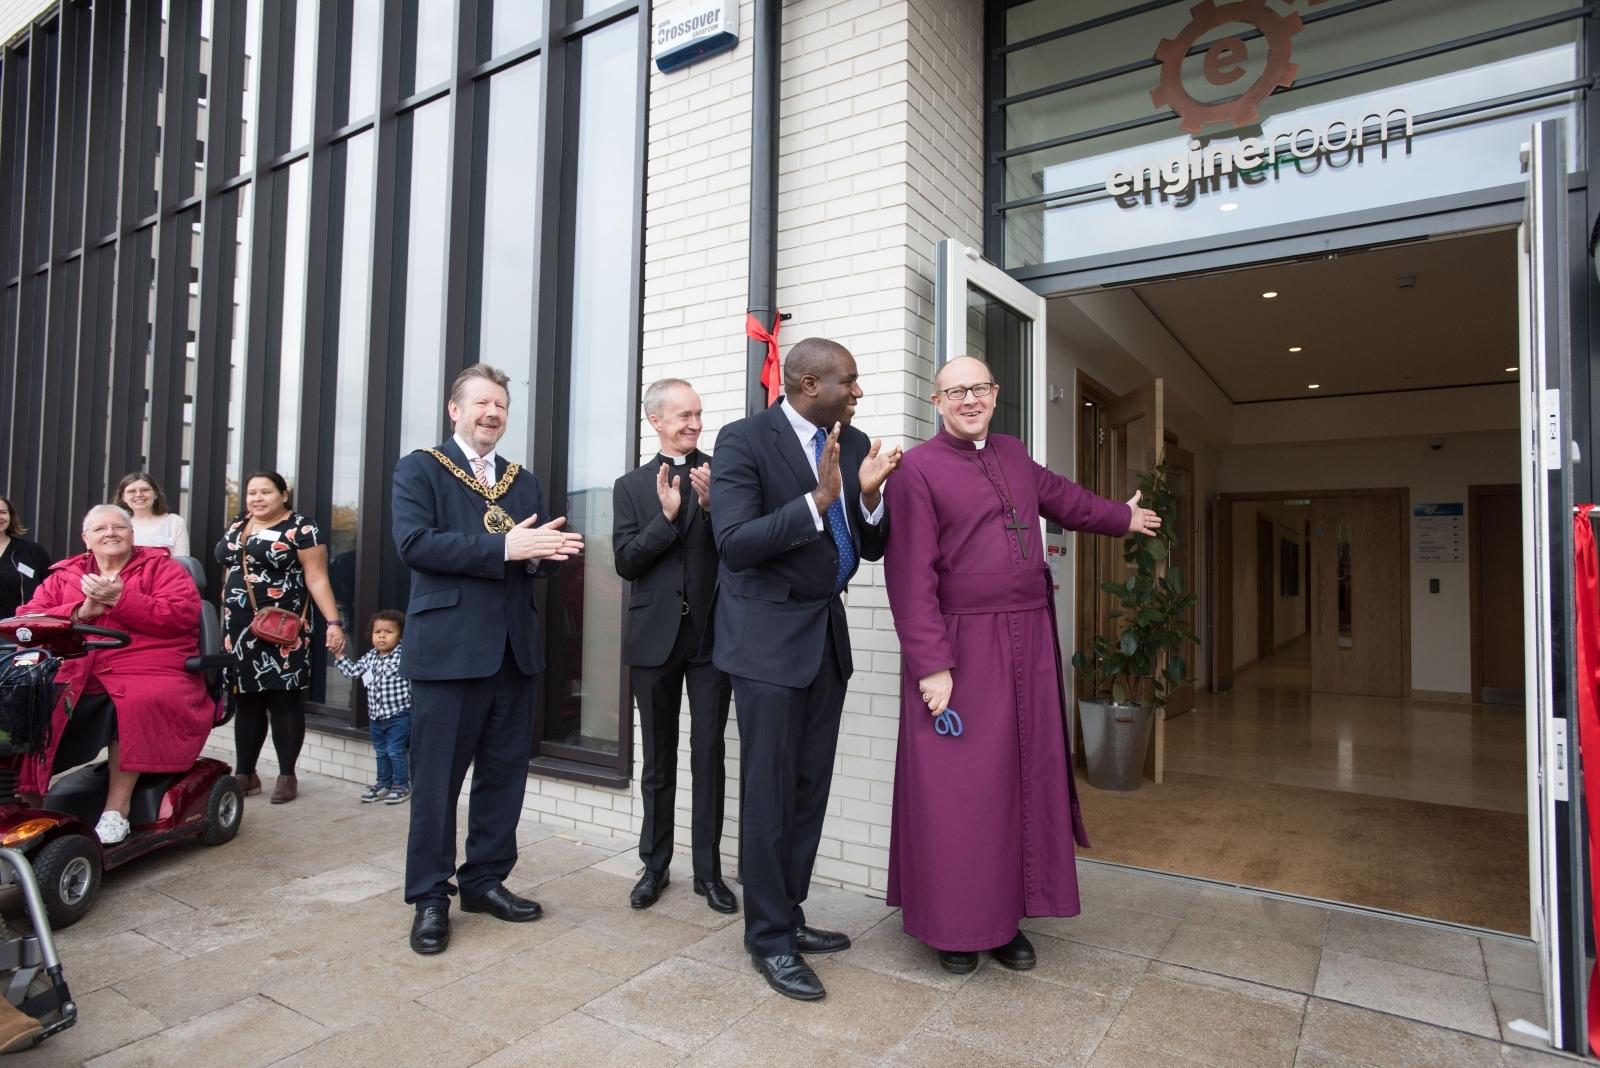 New church in Tottenham Hale, London